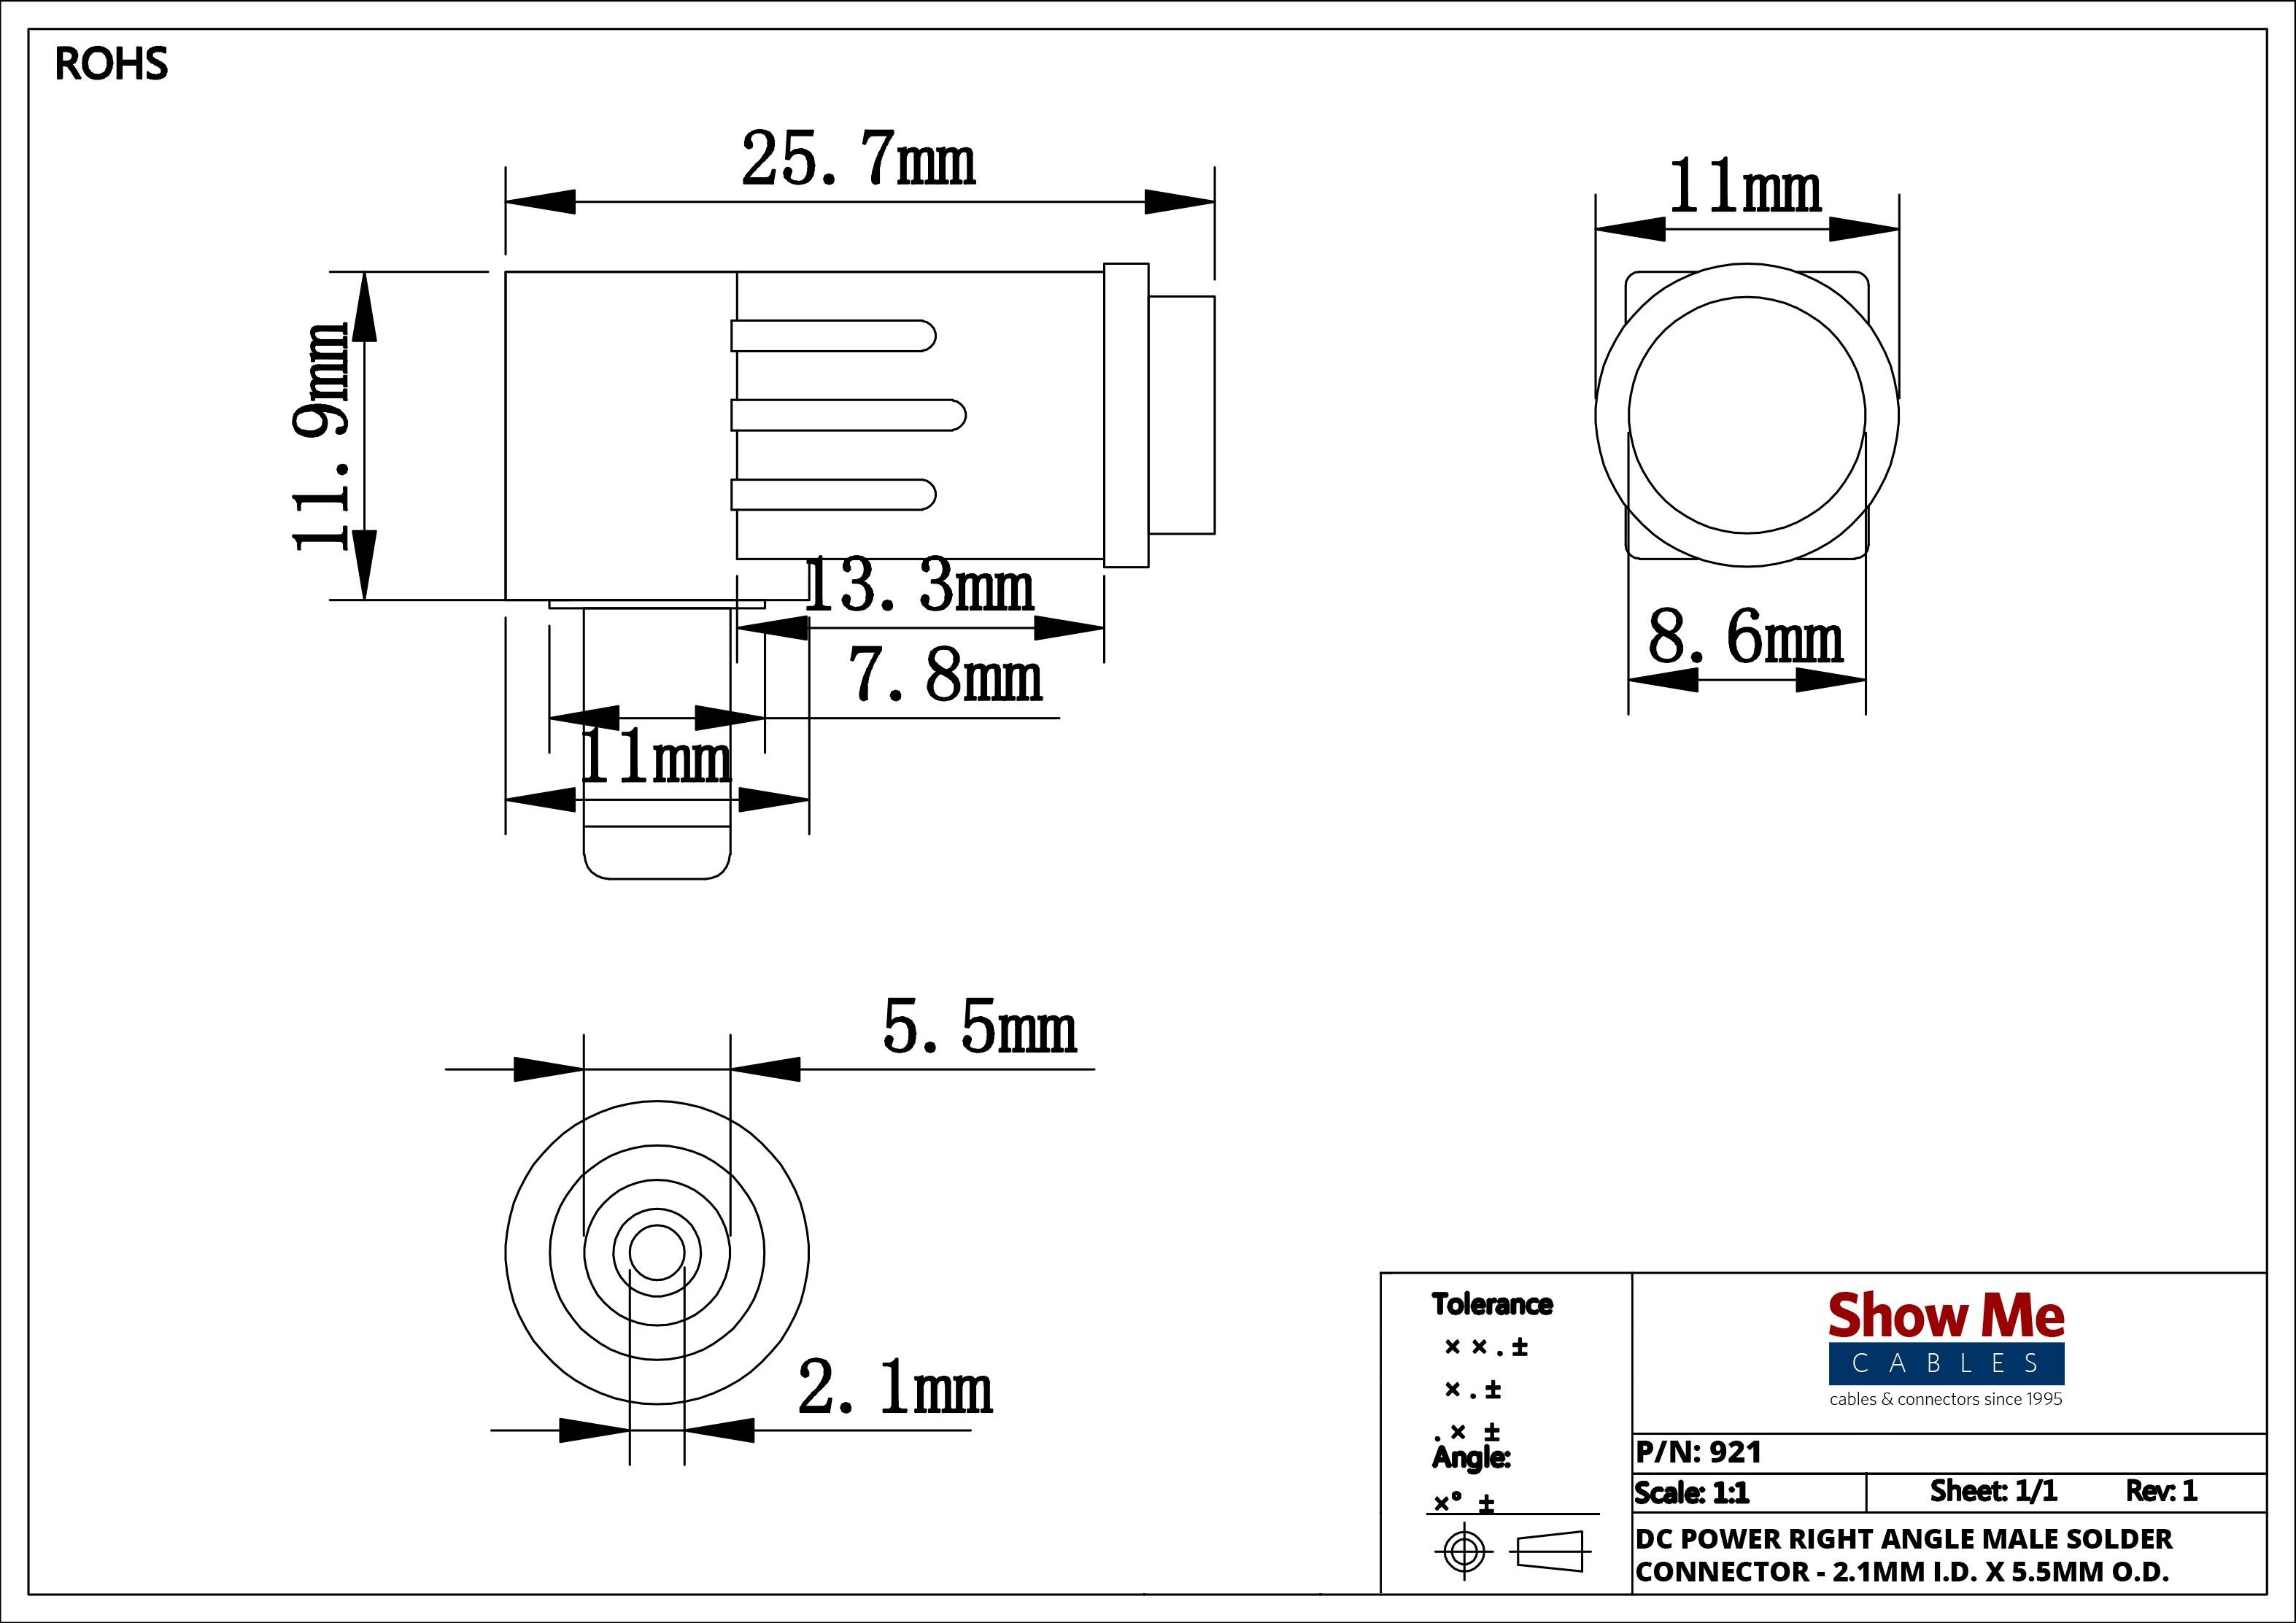 100 Load Center Wiring Diagram Homeline Load Center Hom6 12l100 Wiring Diagram Free